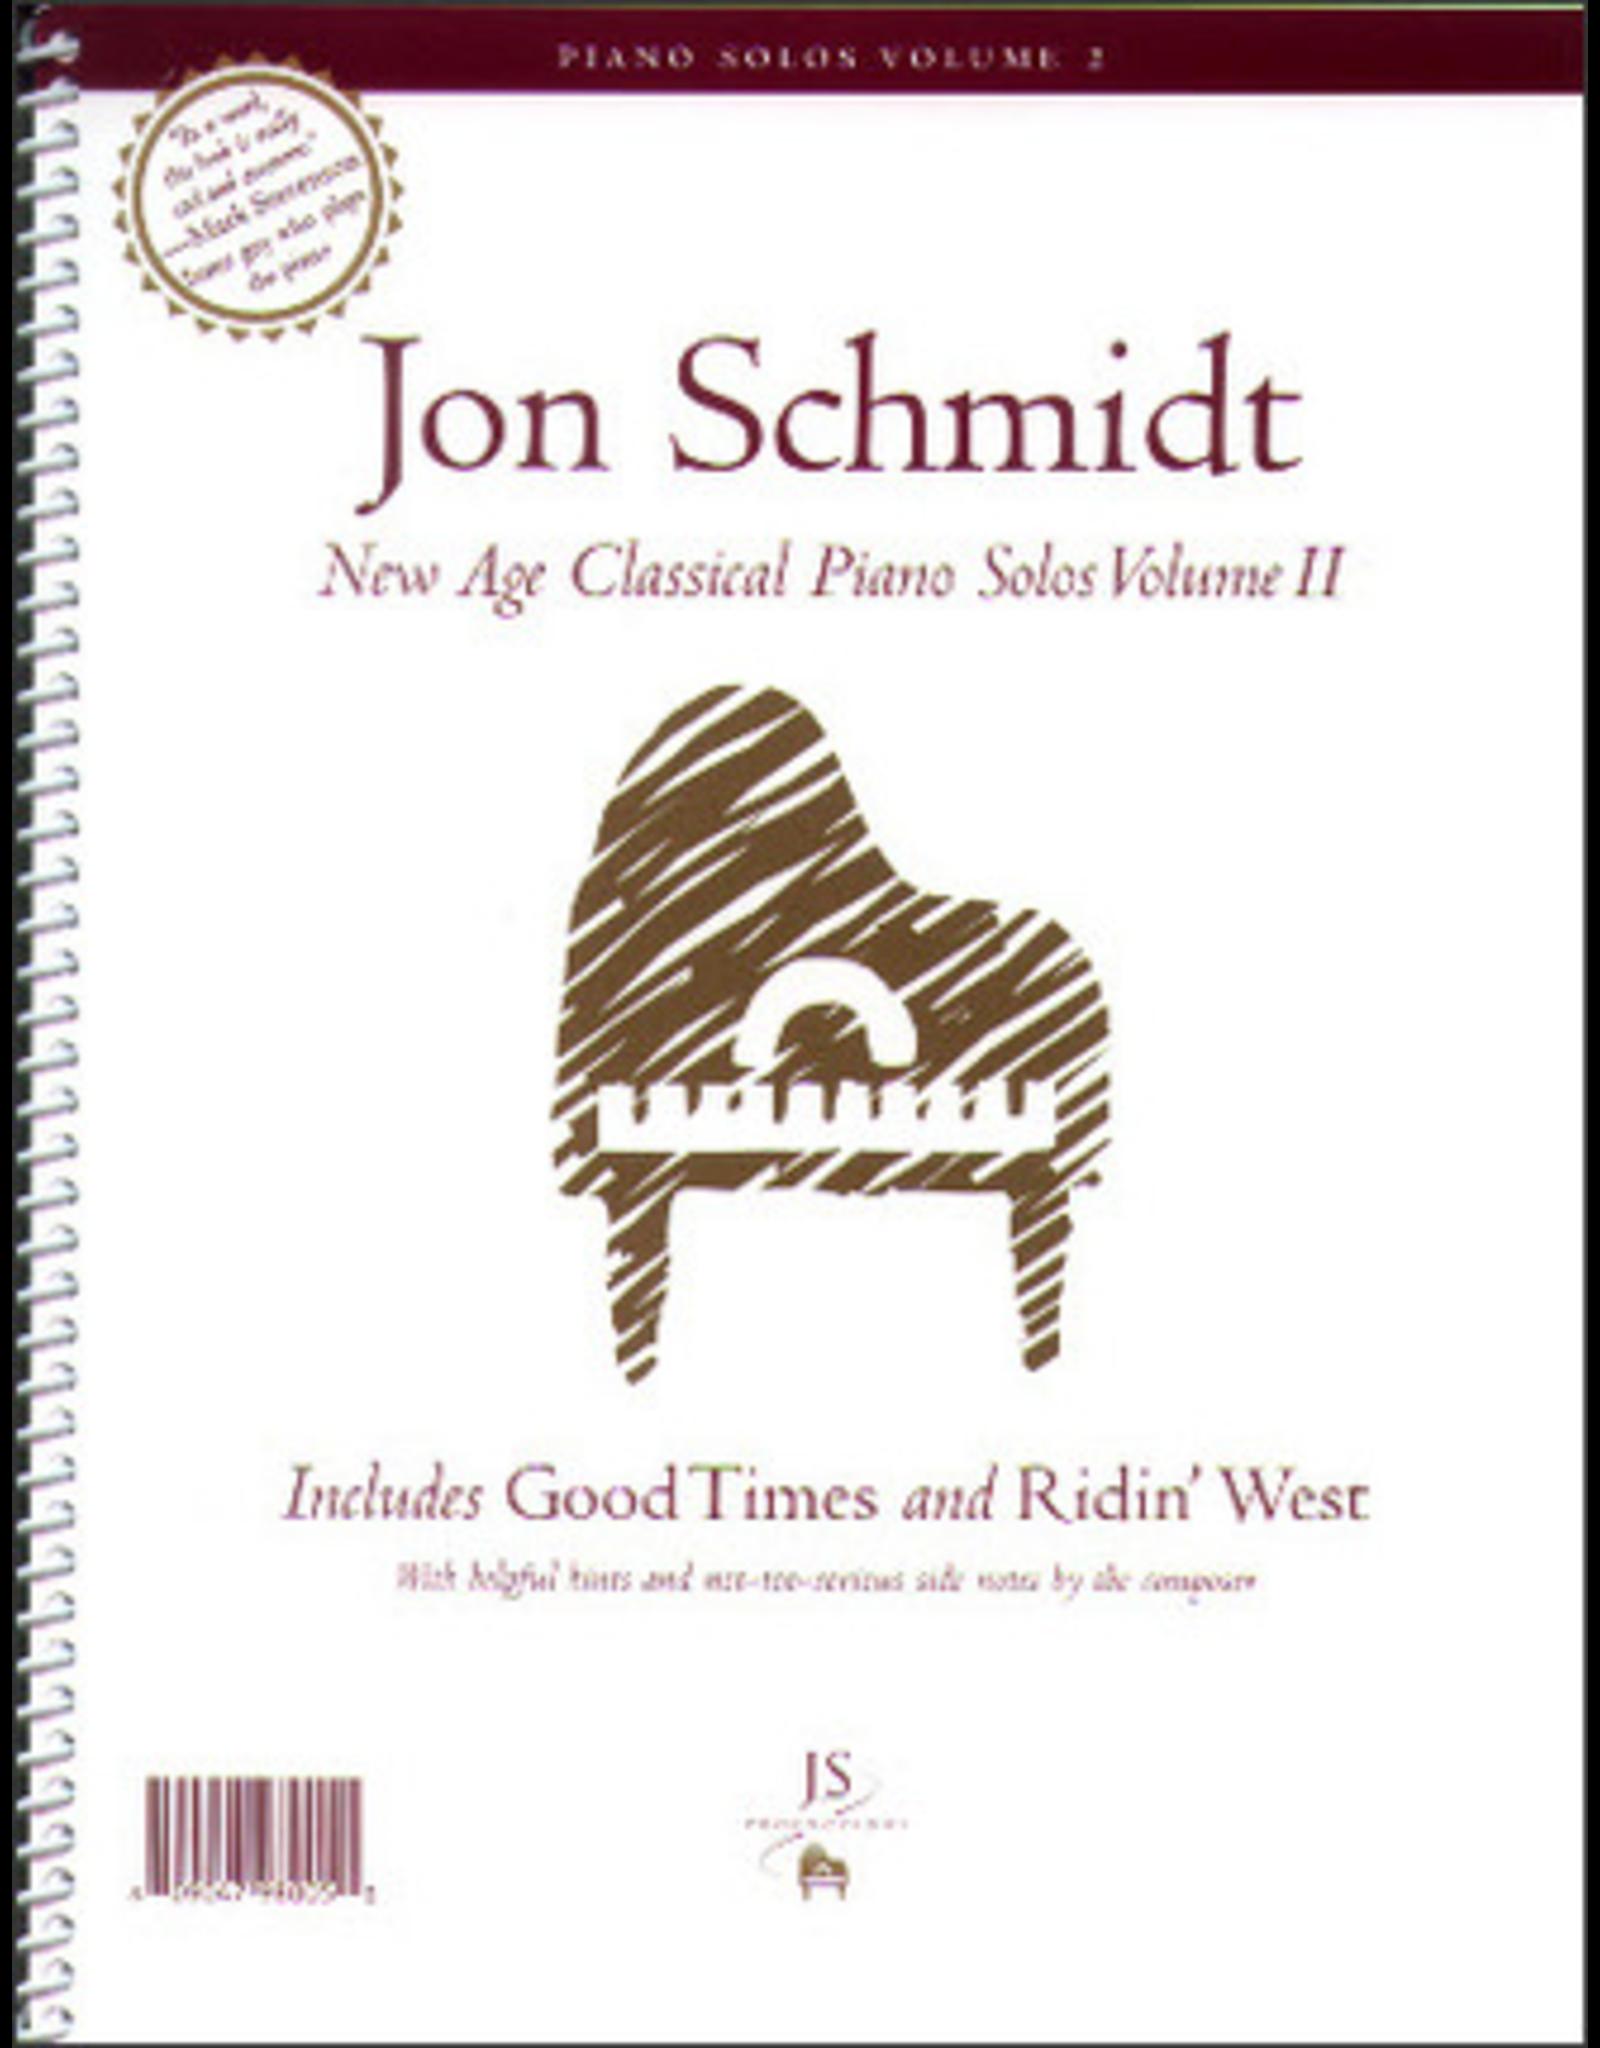 Jon Schmidt Music Jon Schmidt New Age Classical Piano Solos Volume 2.